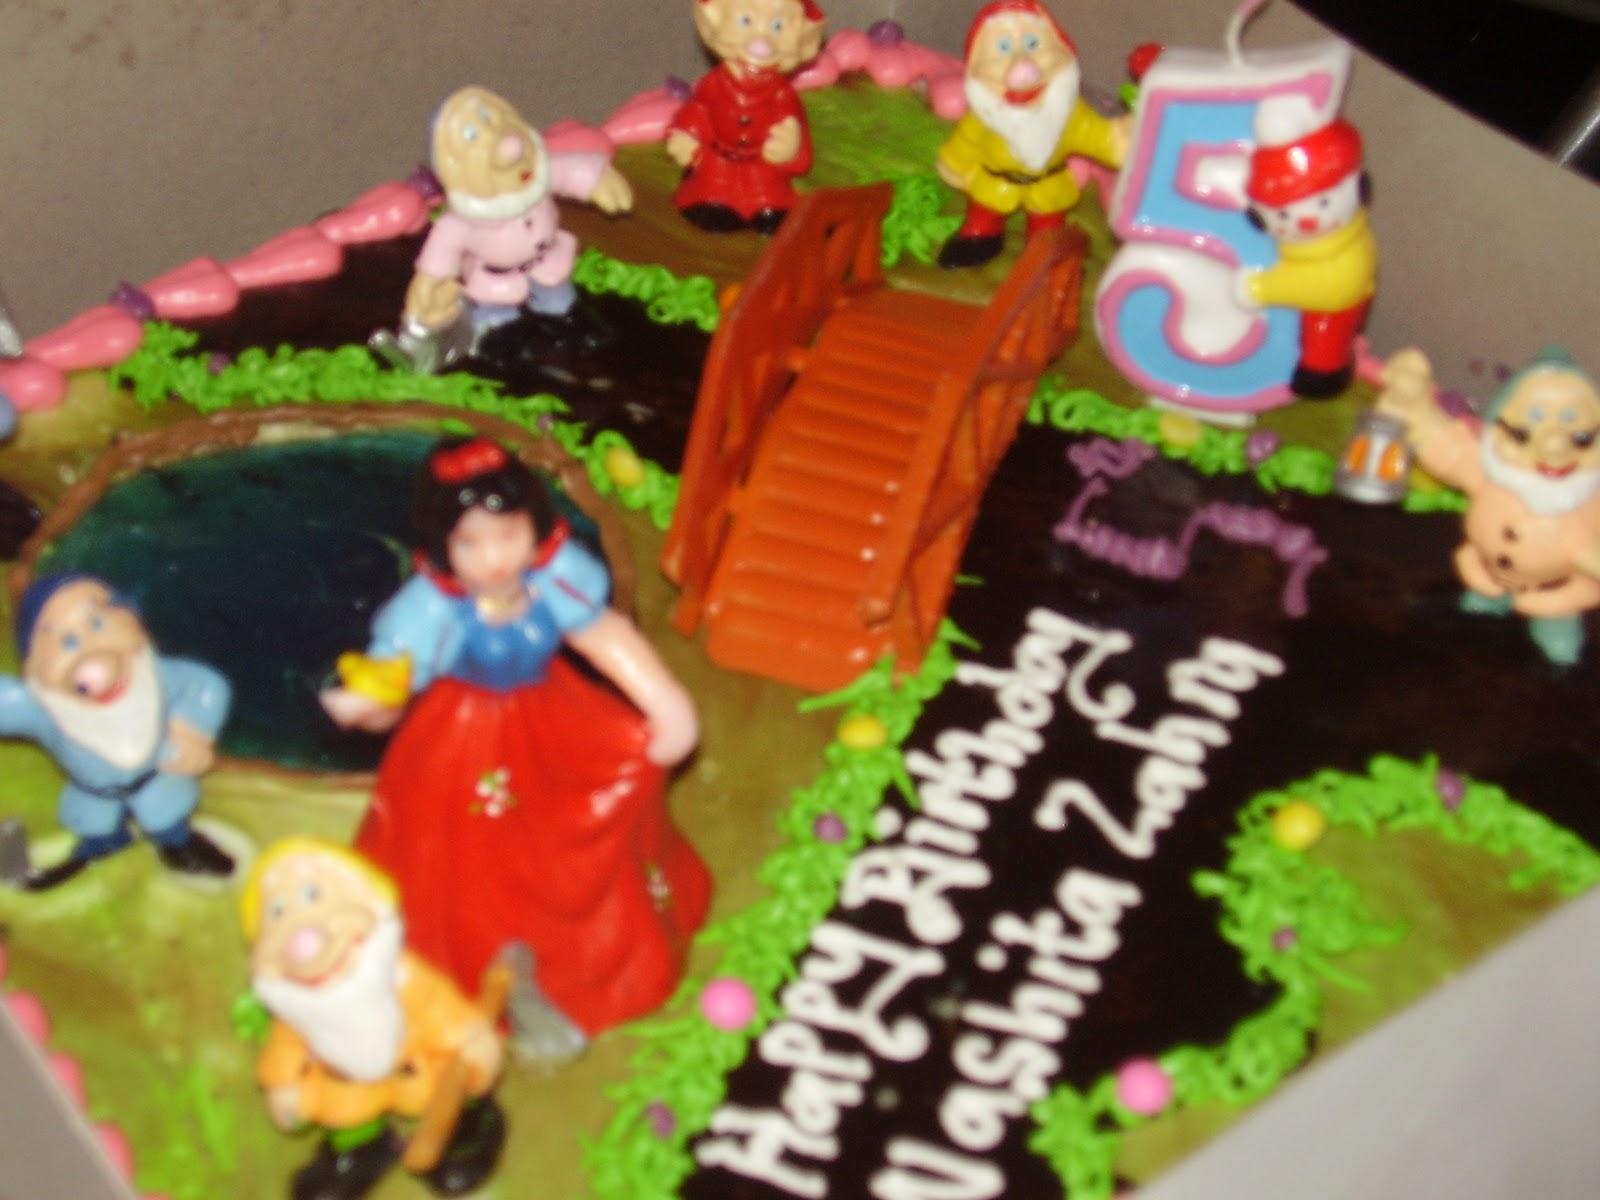 Dora Birthday Party Movie Image Inspiration of Cake and Birthday